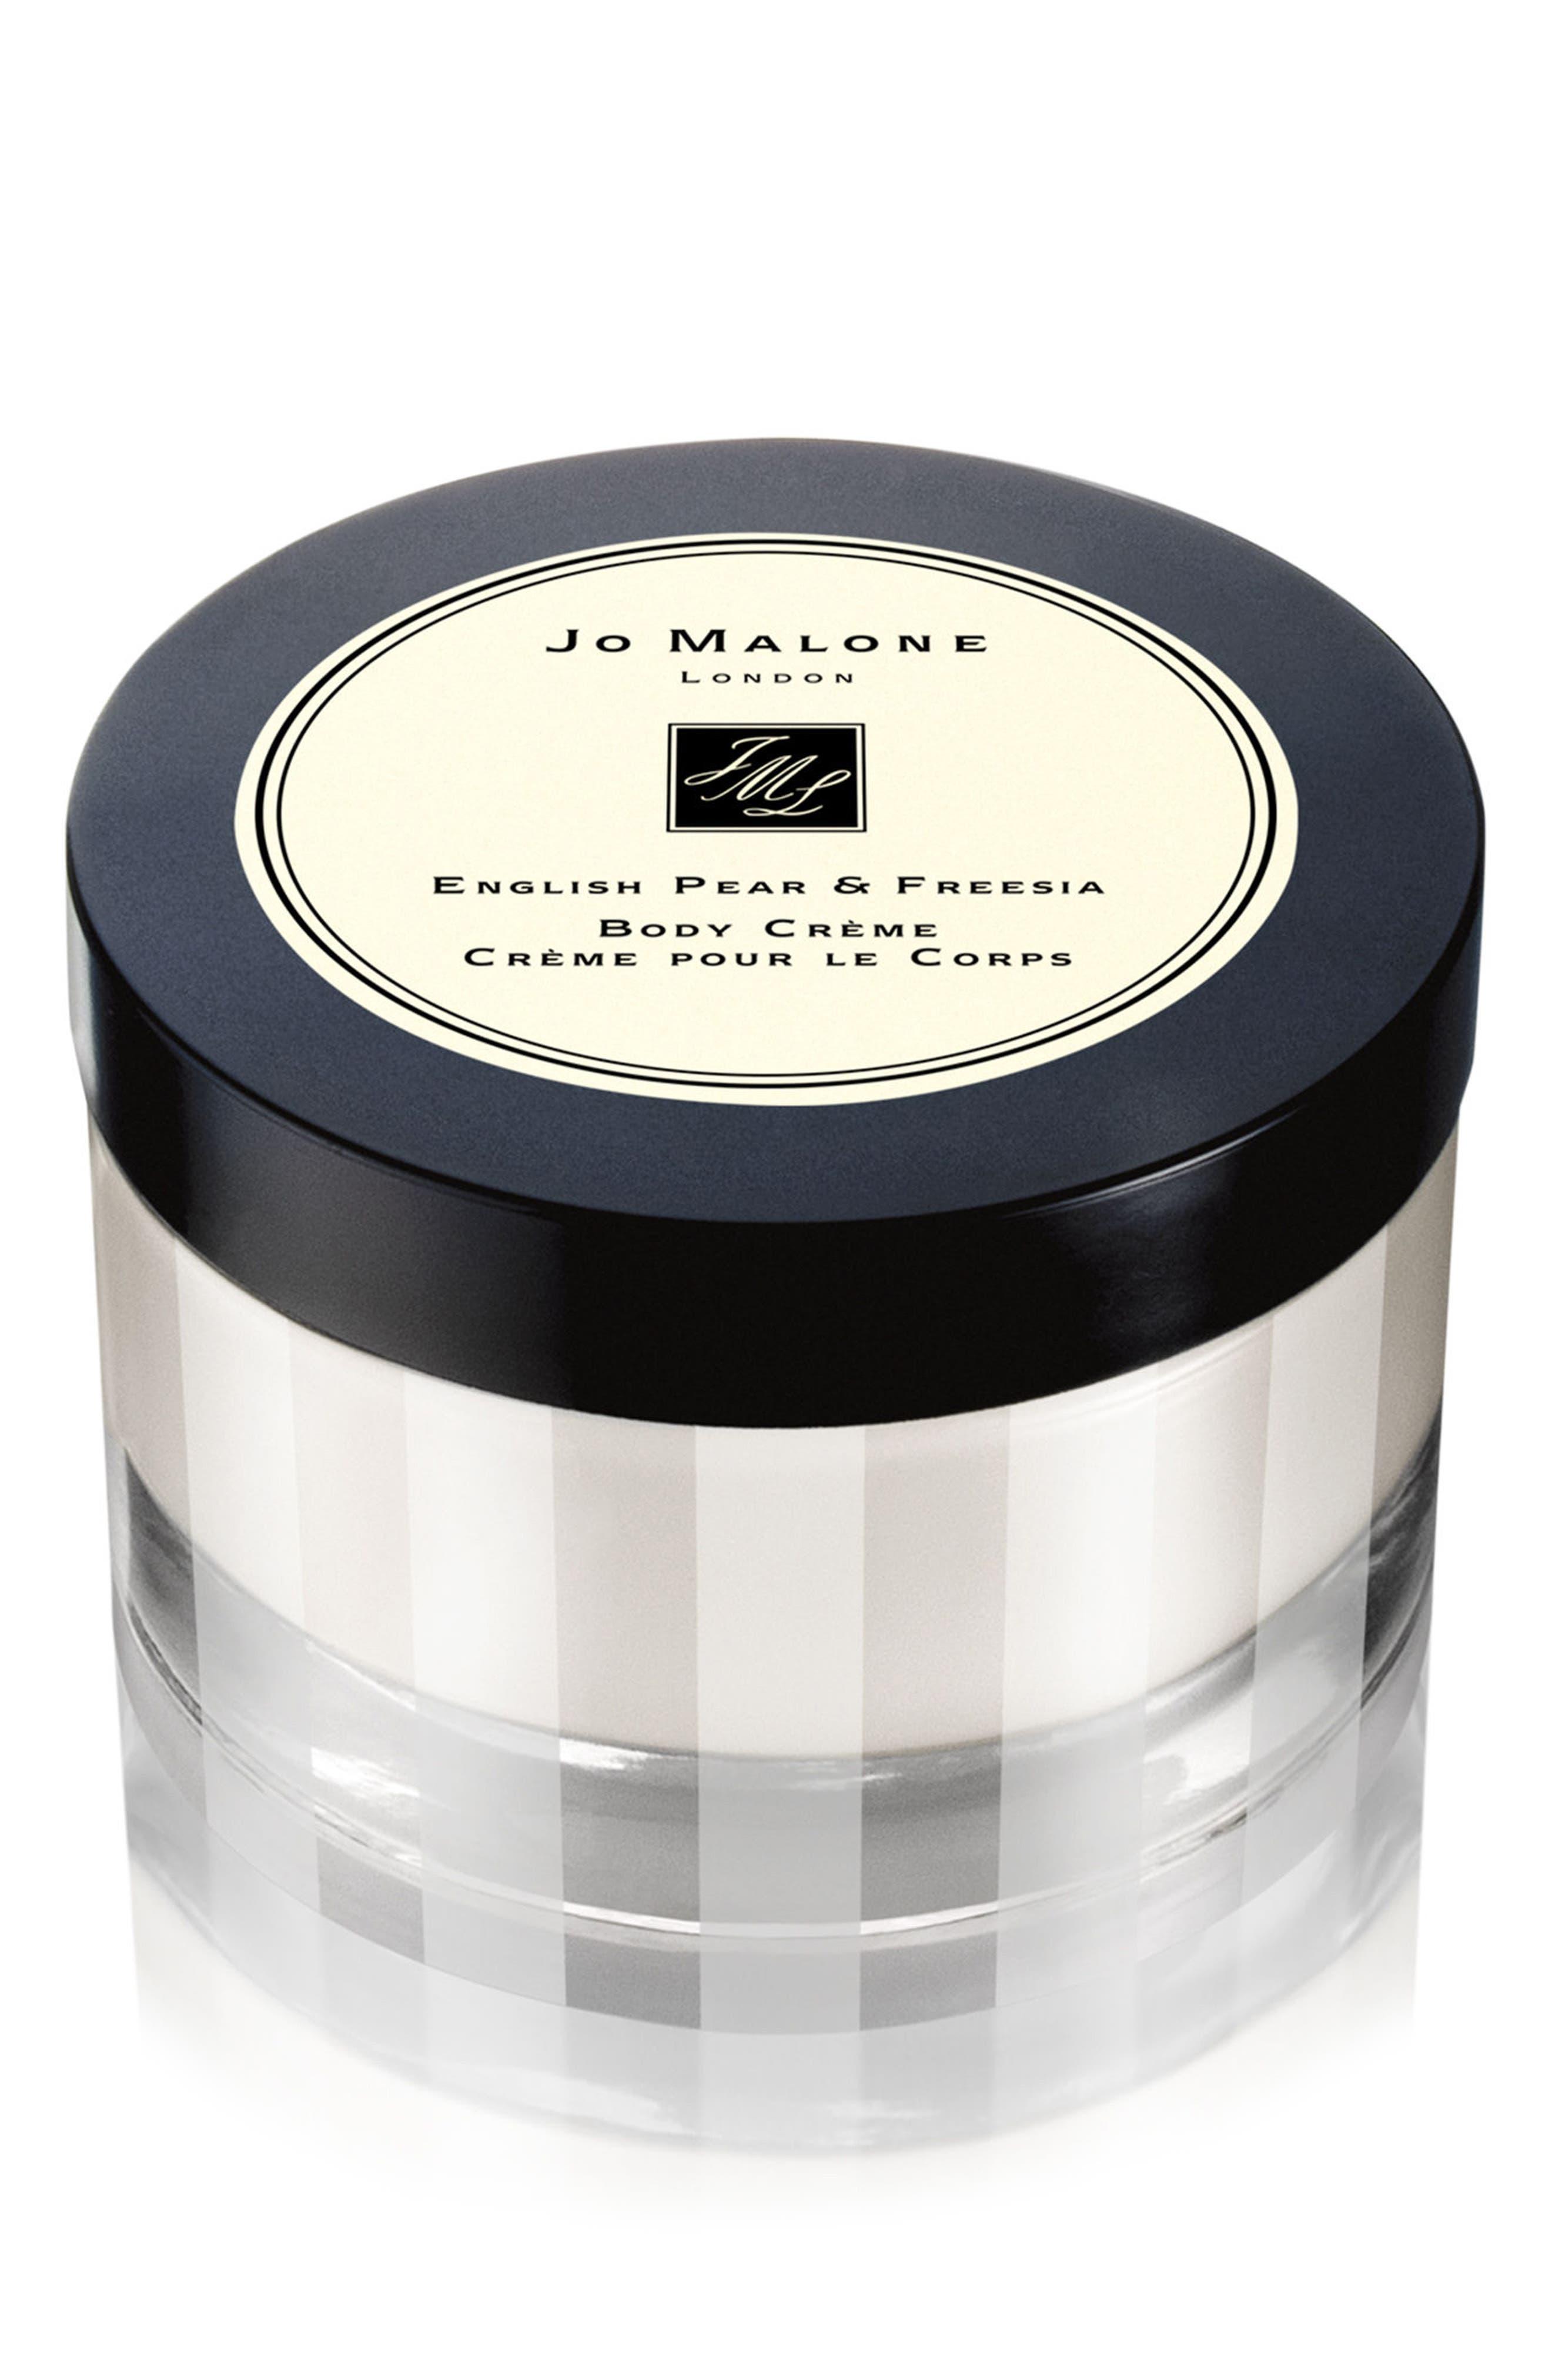 Alternate Image 1 Selected - Jo Malone London™ English Pear & Freesia Body Crème